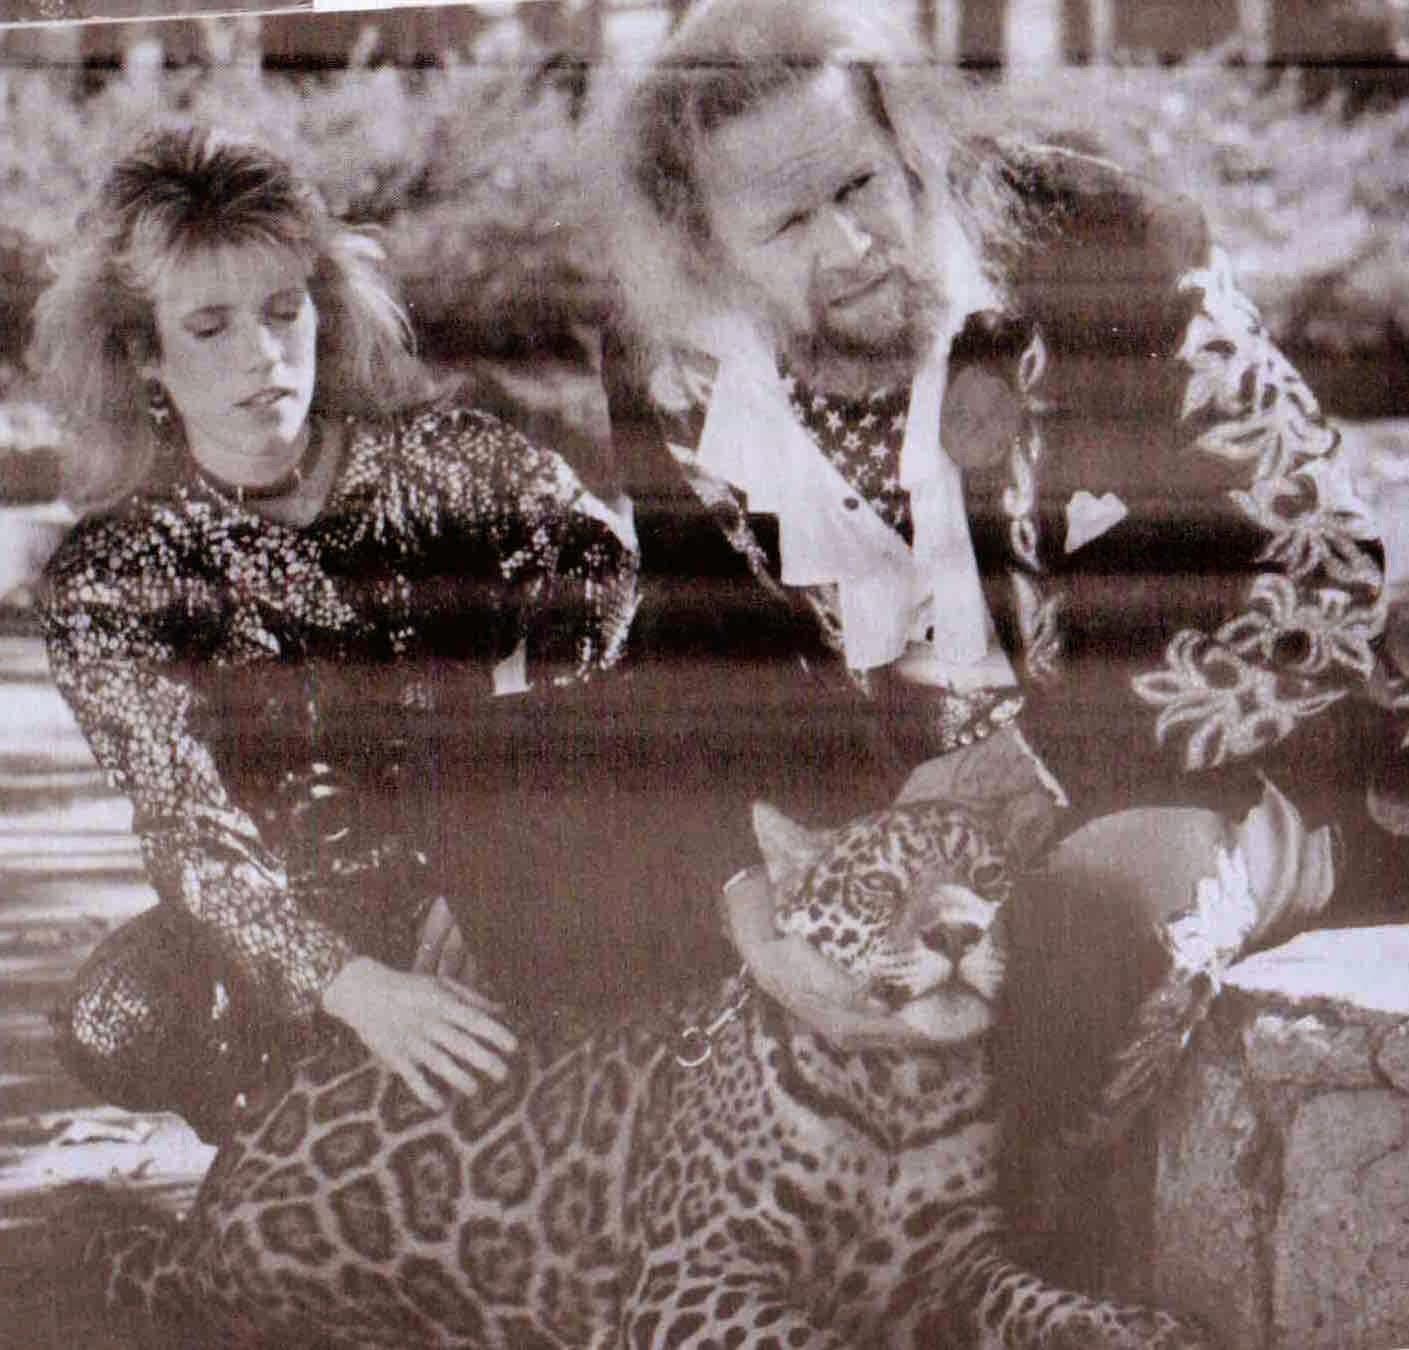 David Allan & Jody Coe with Lulu the Jaguar